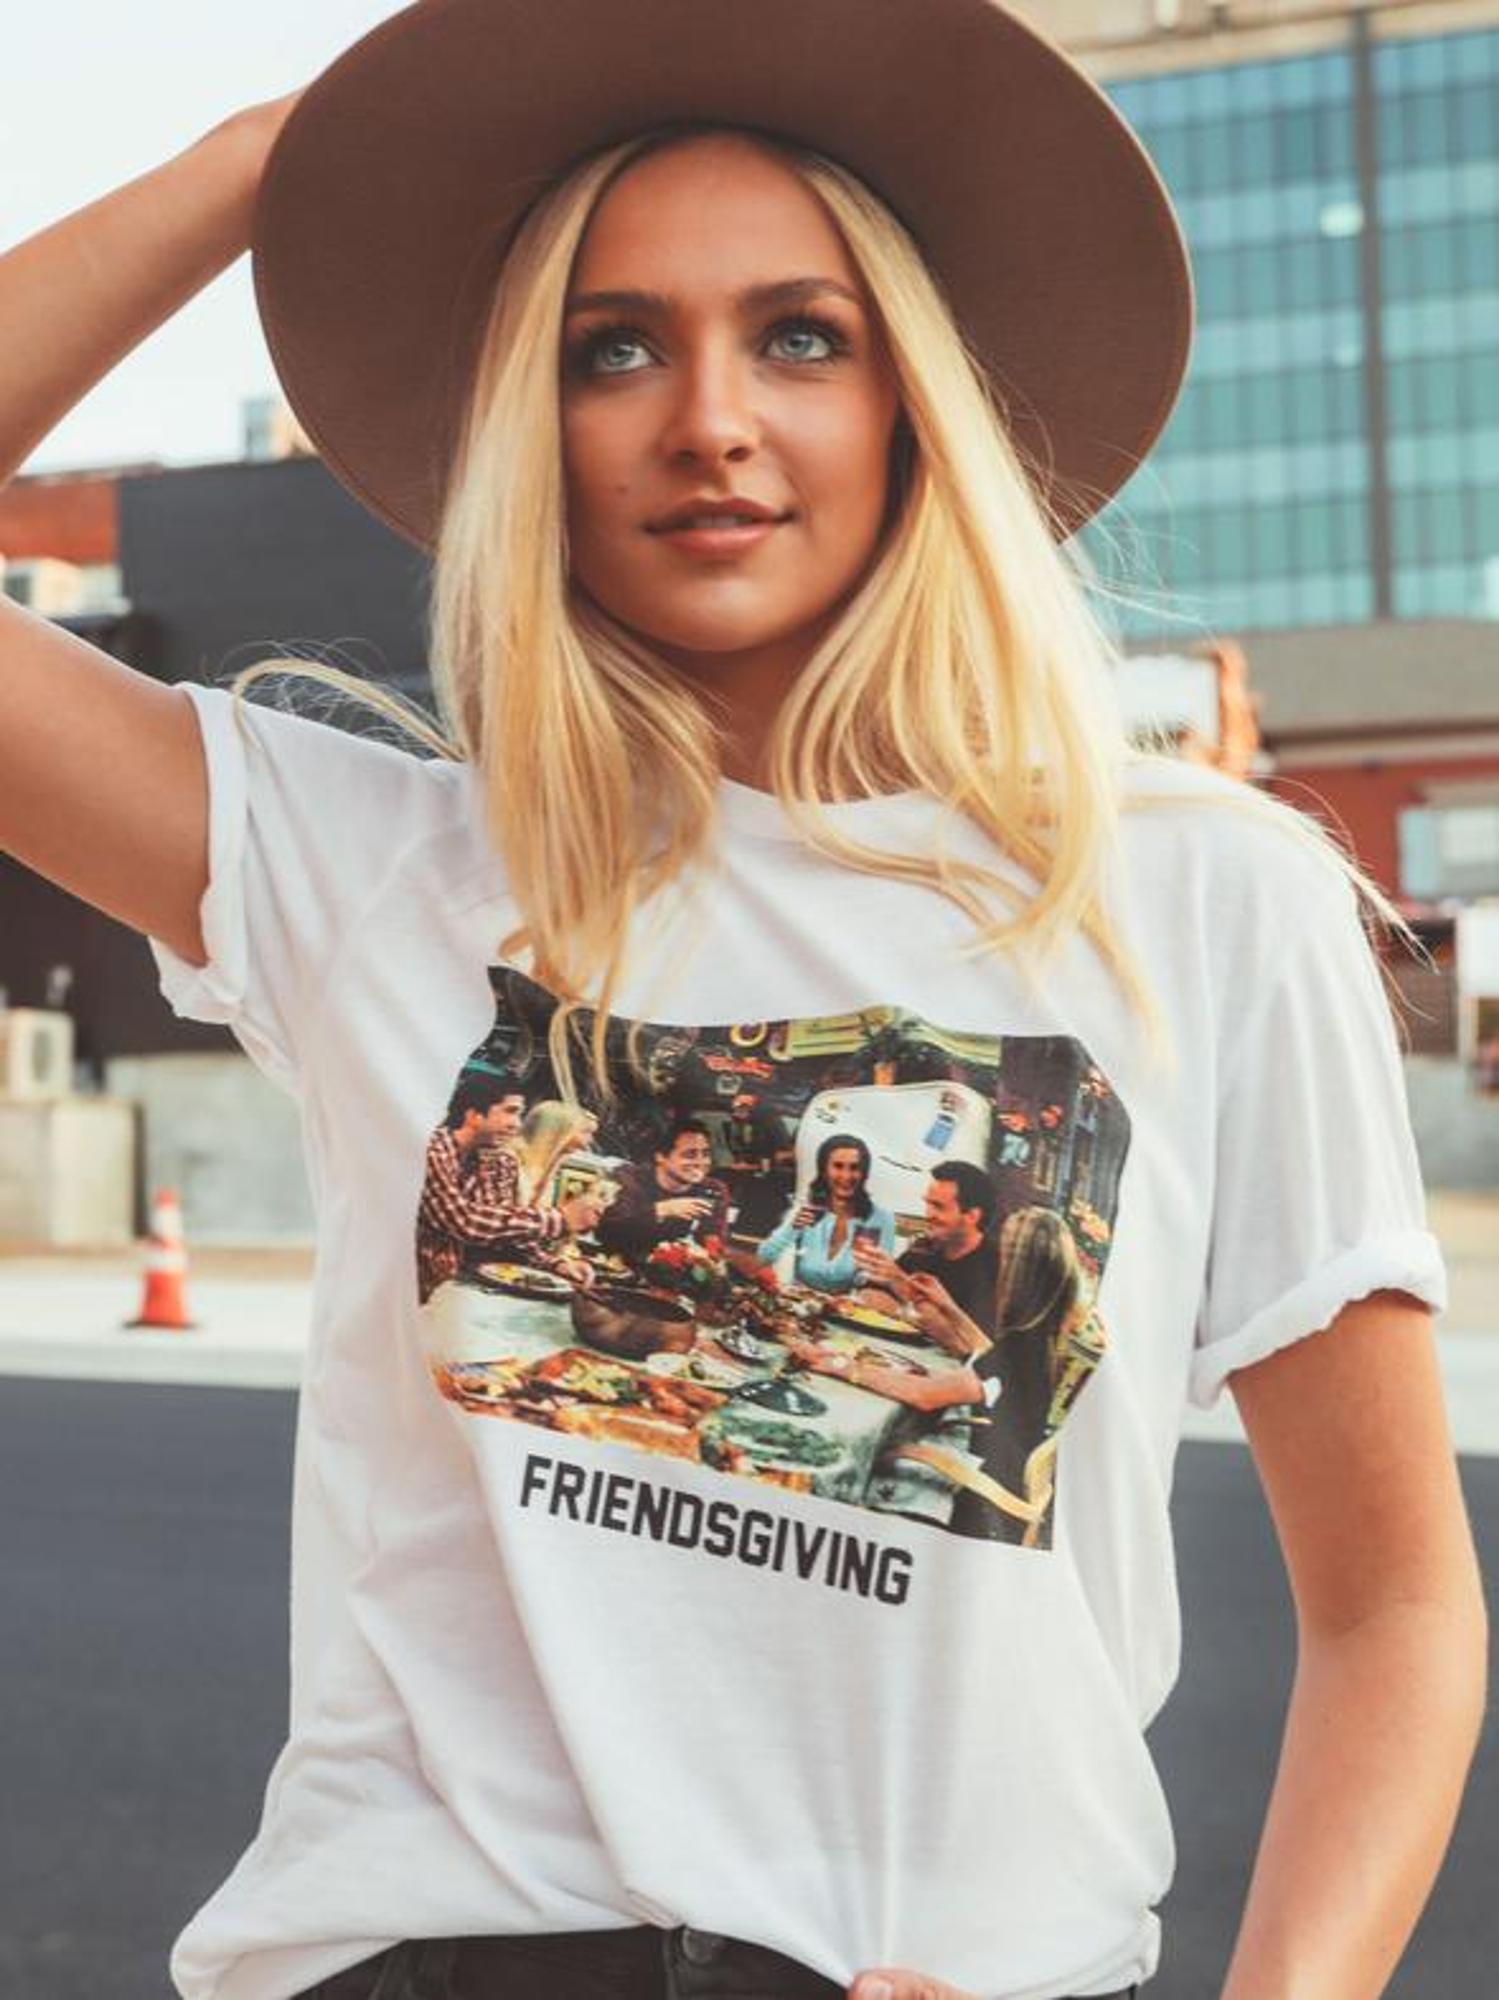 image of: Friendsgiving Women's Tee